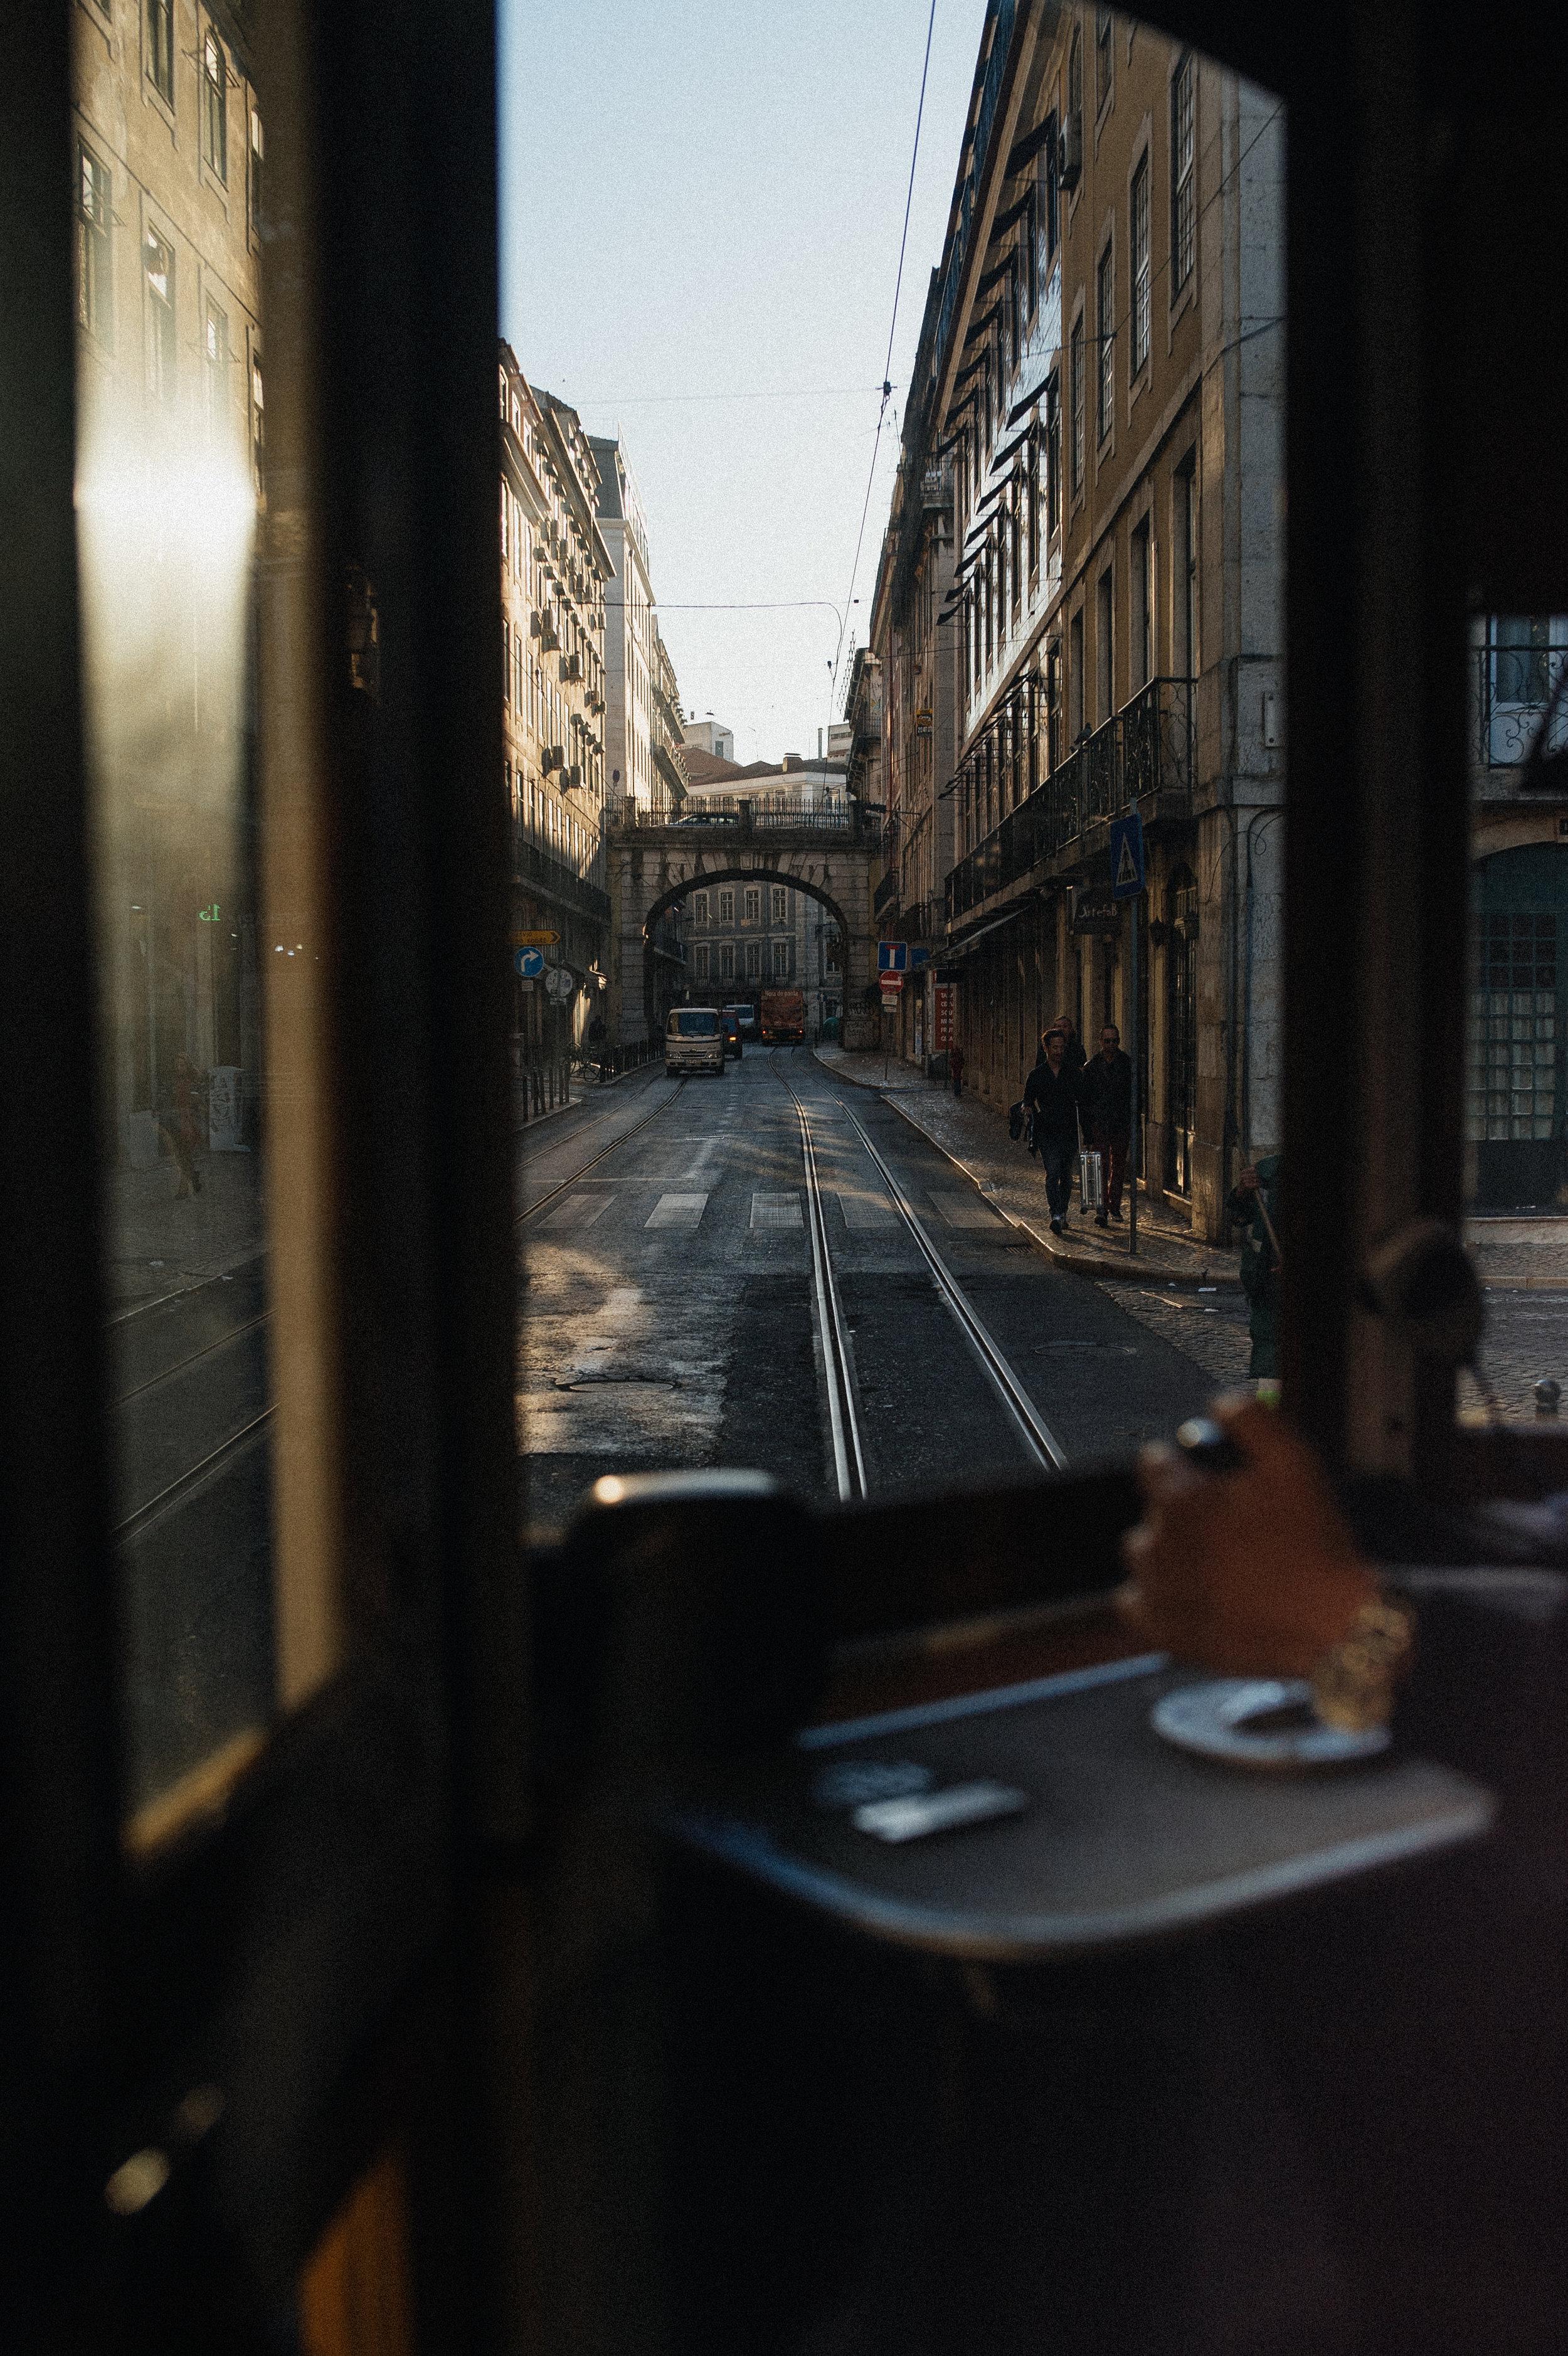 Lisboa-escape-DSTN-Paquerettes-1.jpg